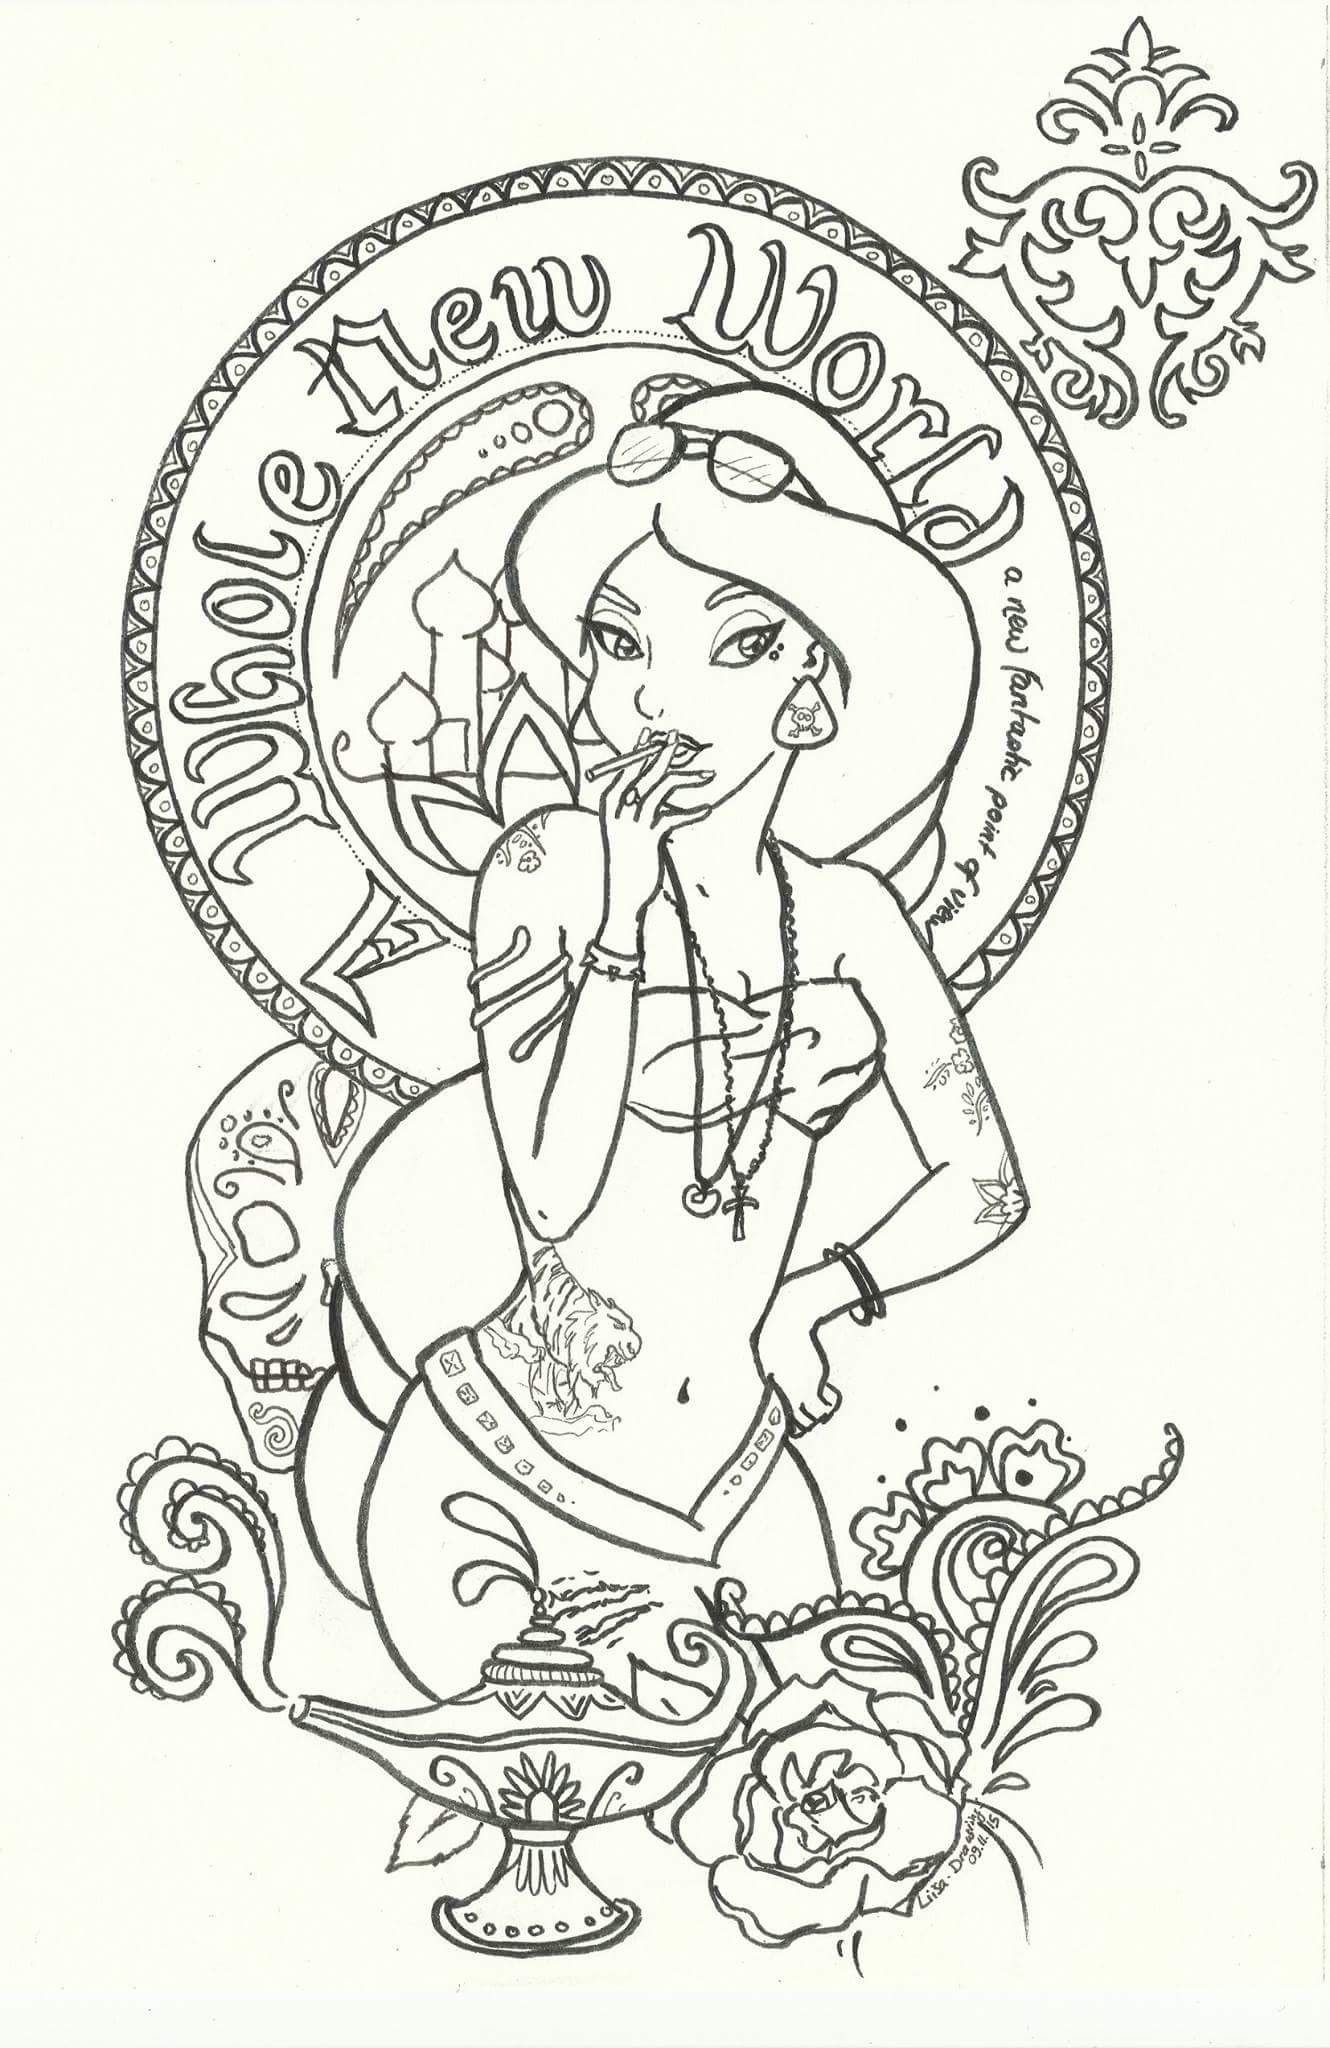 Pin by Shivsadh Prabhu on Disney 26  Disney princess coloring